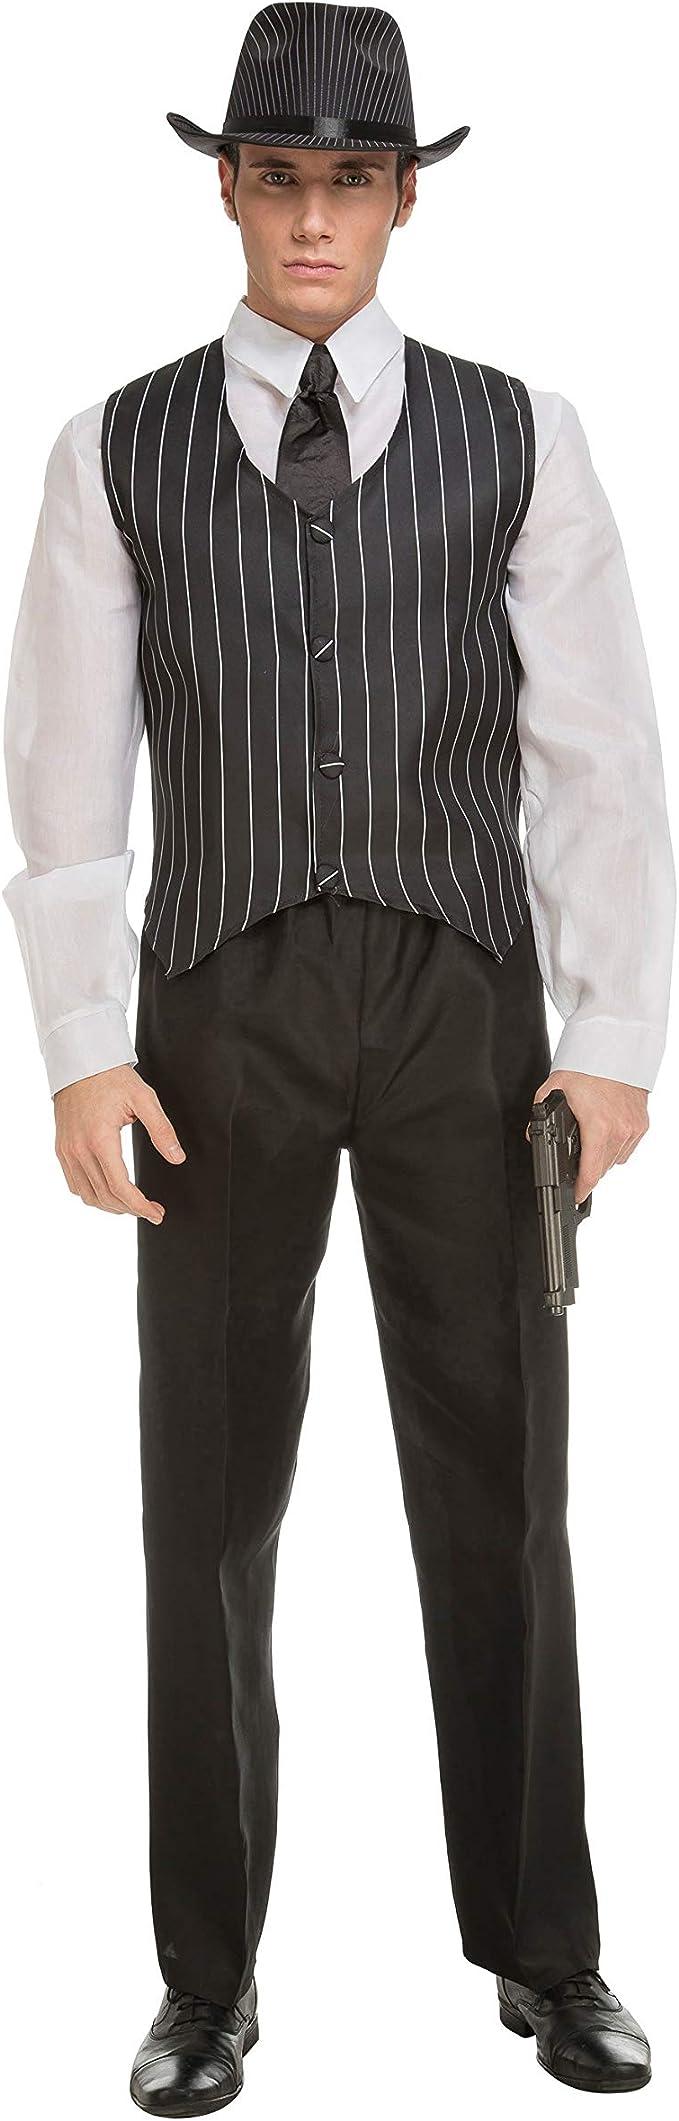 My Other Me Me-201705 Mafiosos Disfraz de gangster para hombre ...